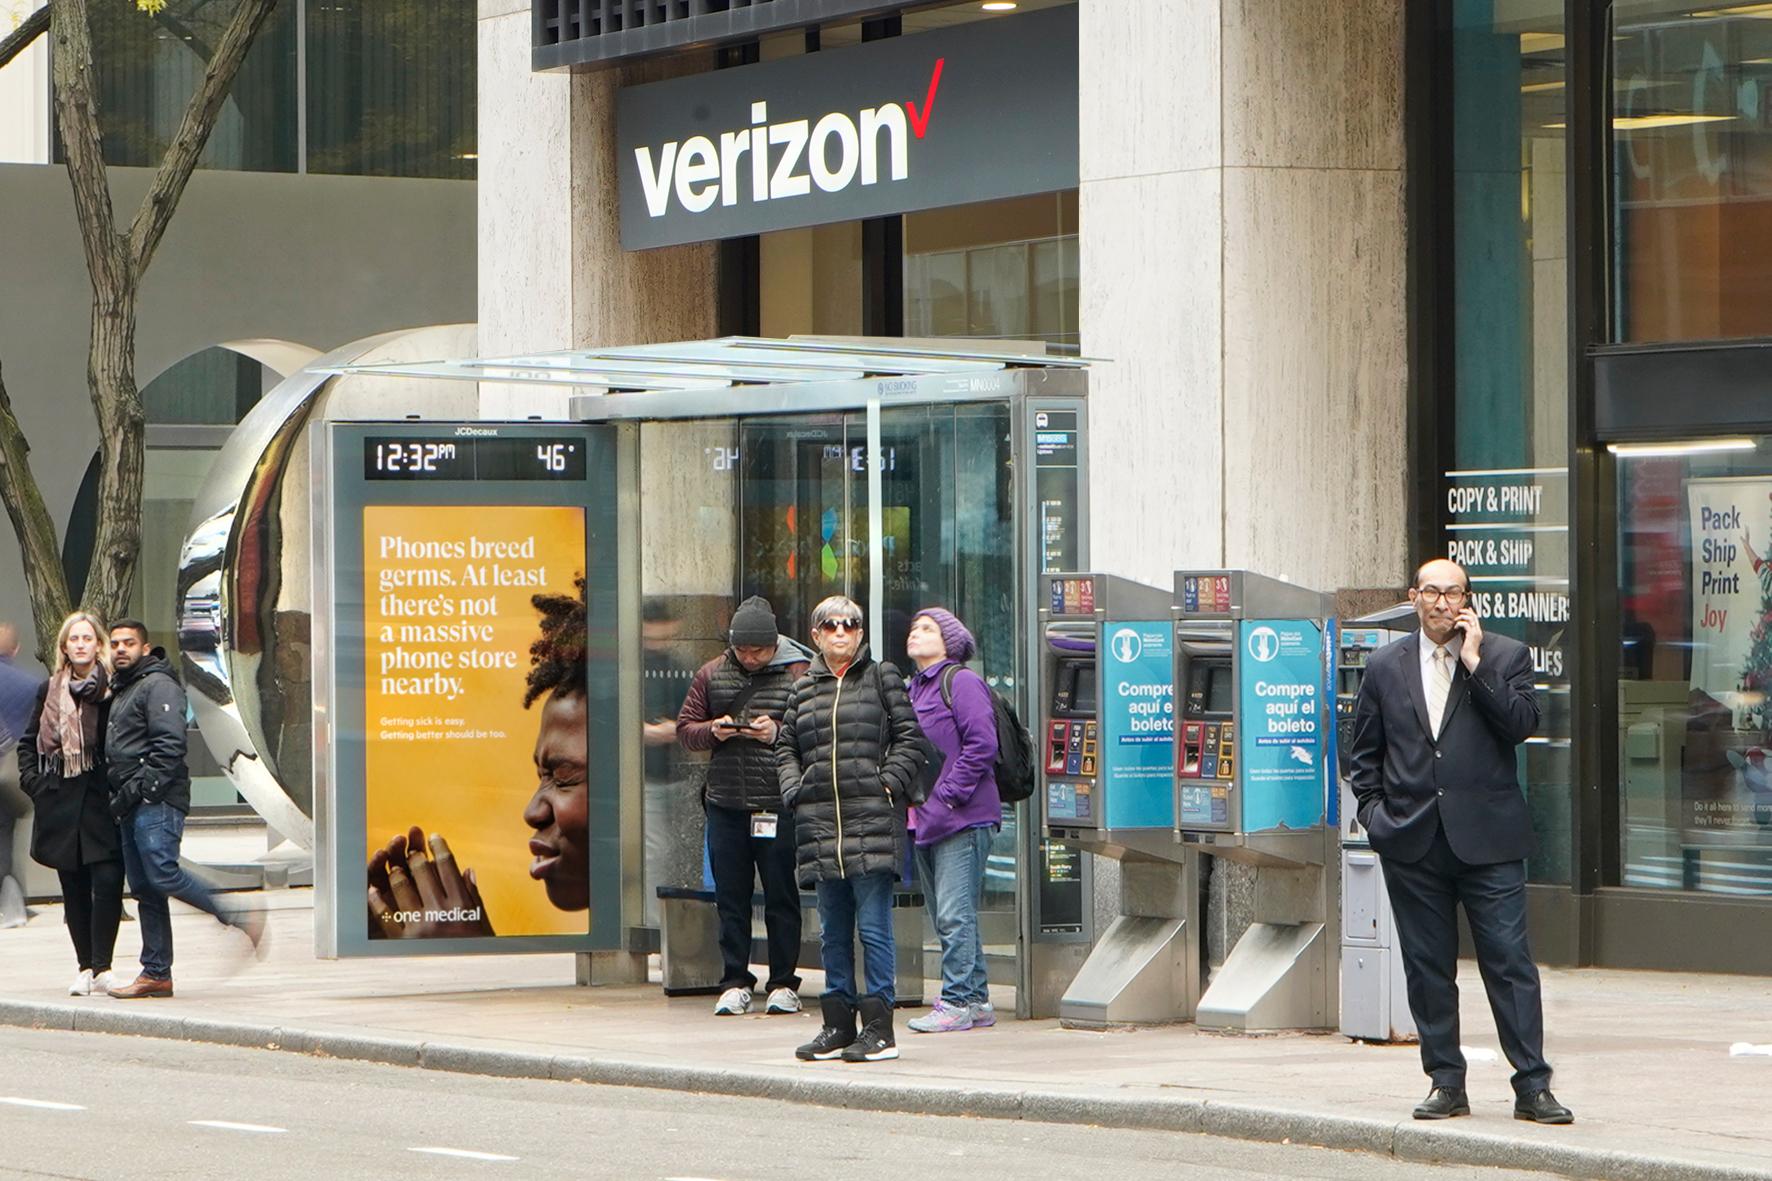 One Medical - phone store.jpg